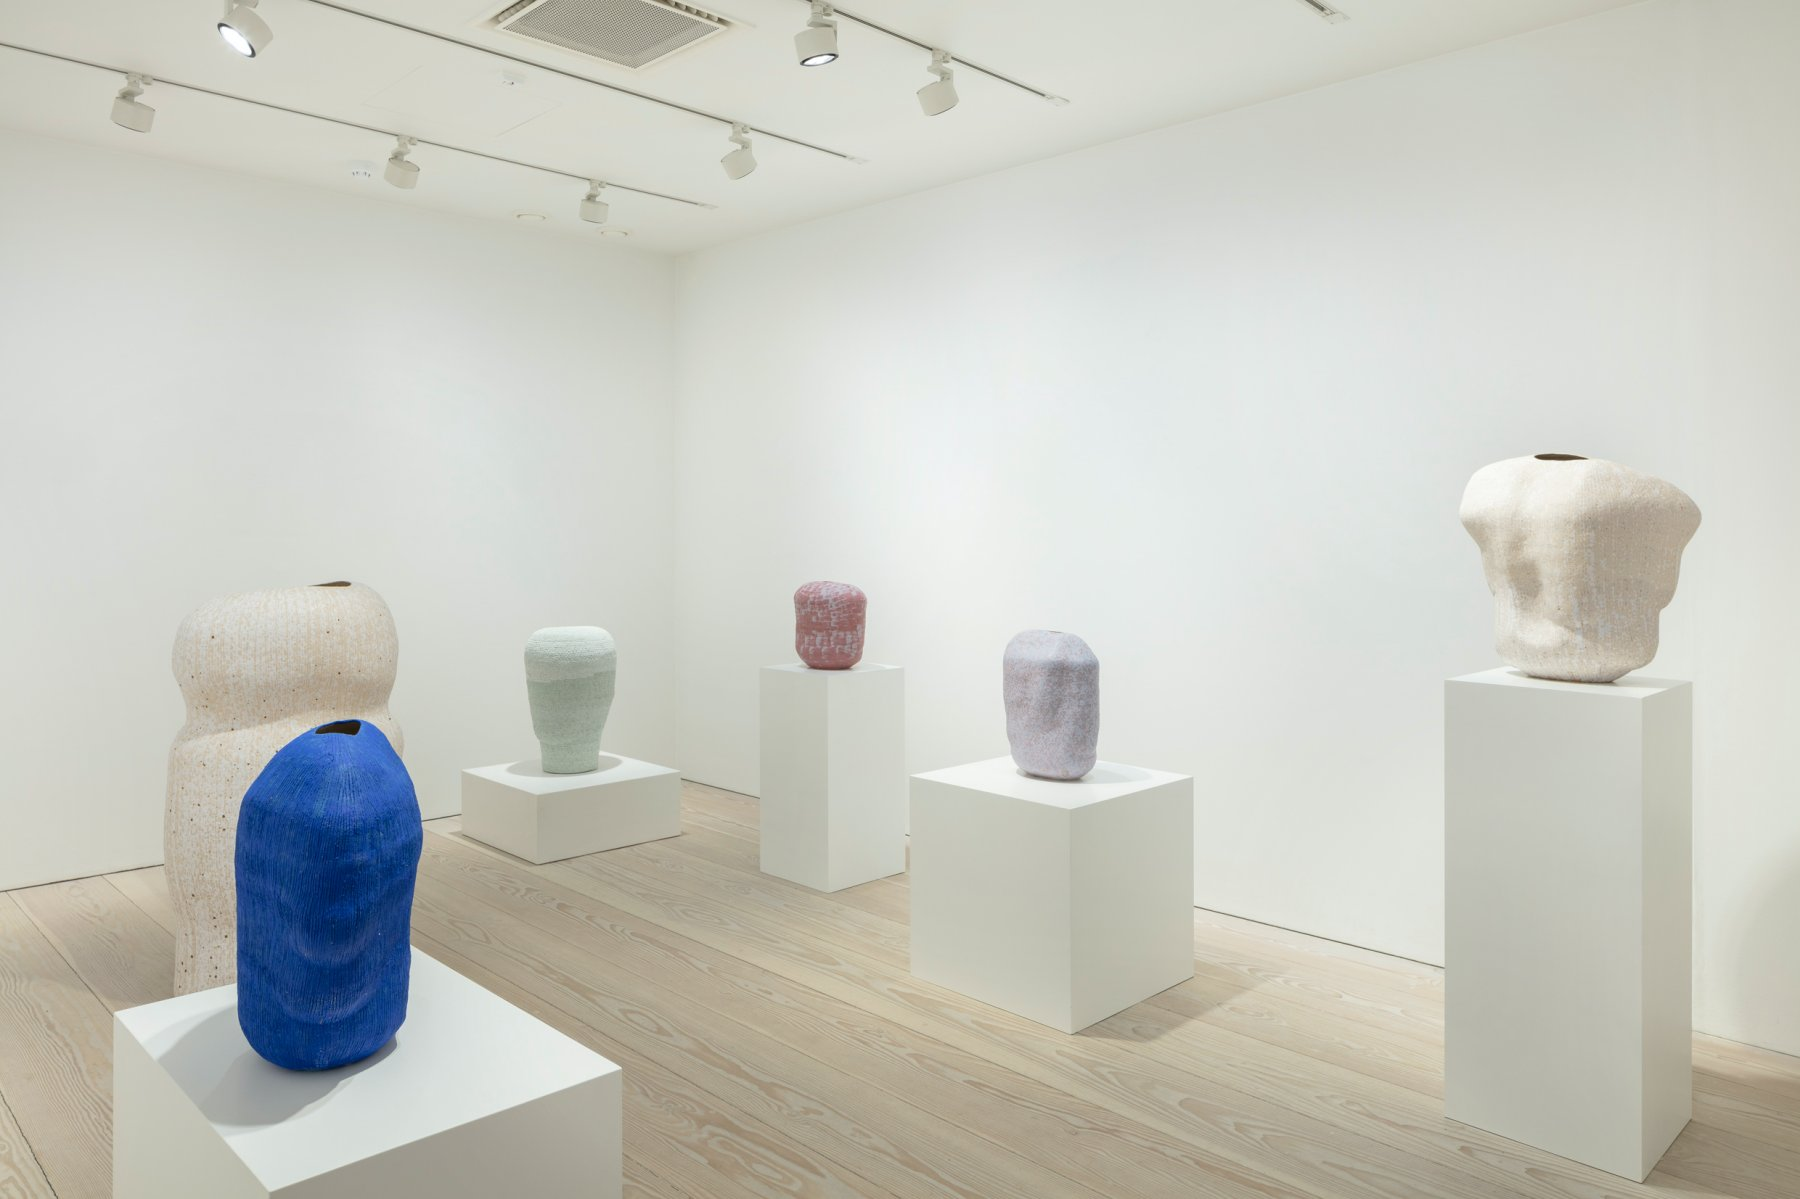 Galerie Forsblom Kristina Riska 1 2021